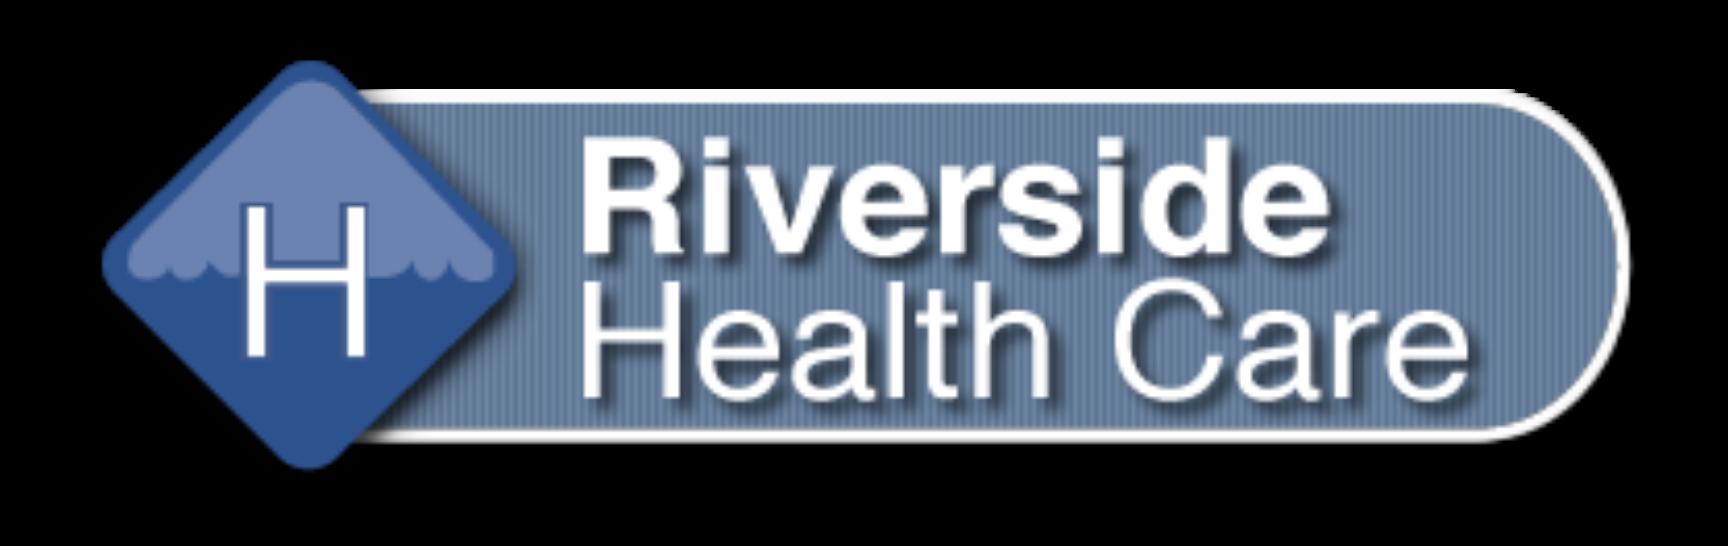 Riverside Health Care